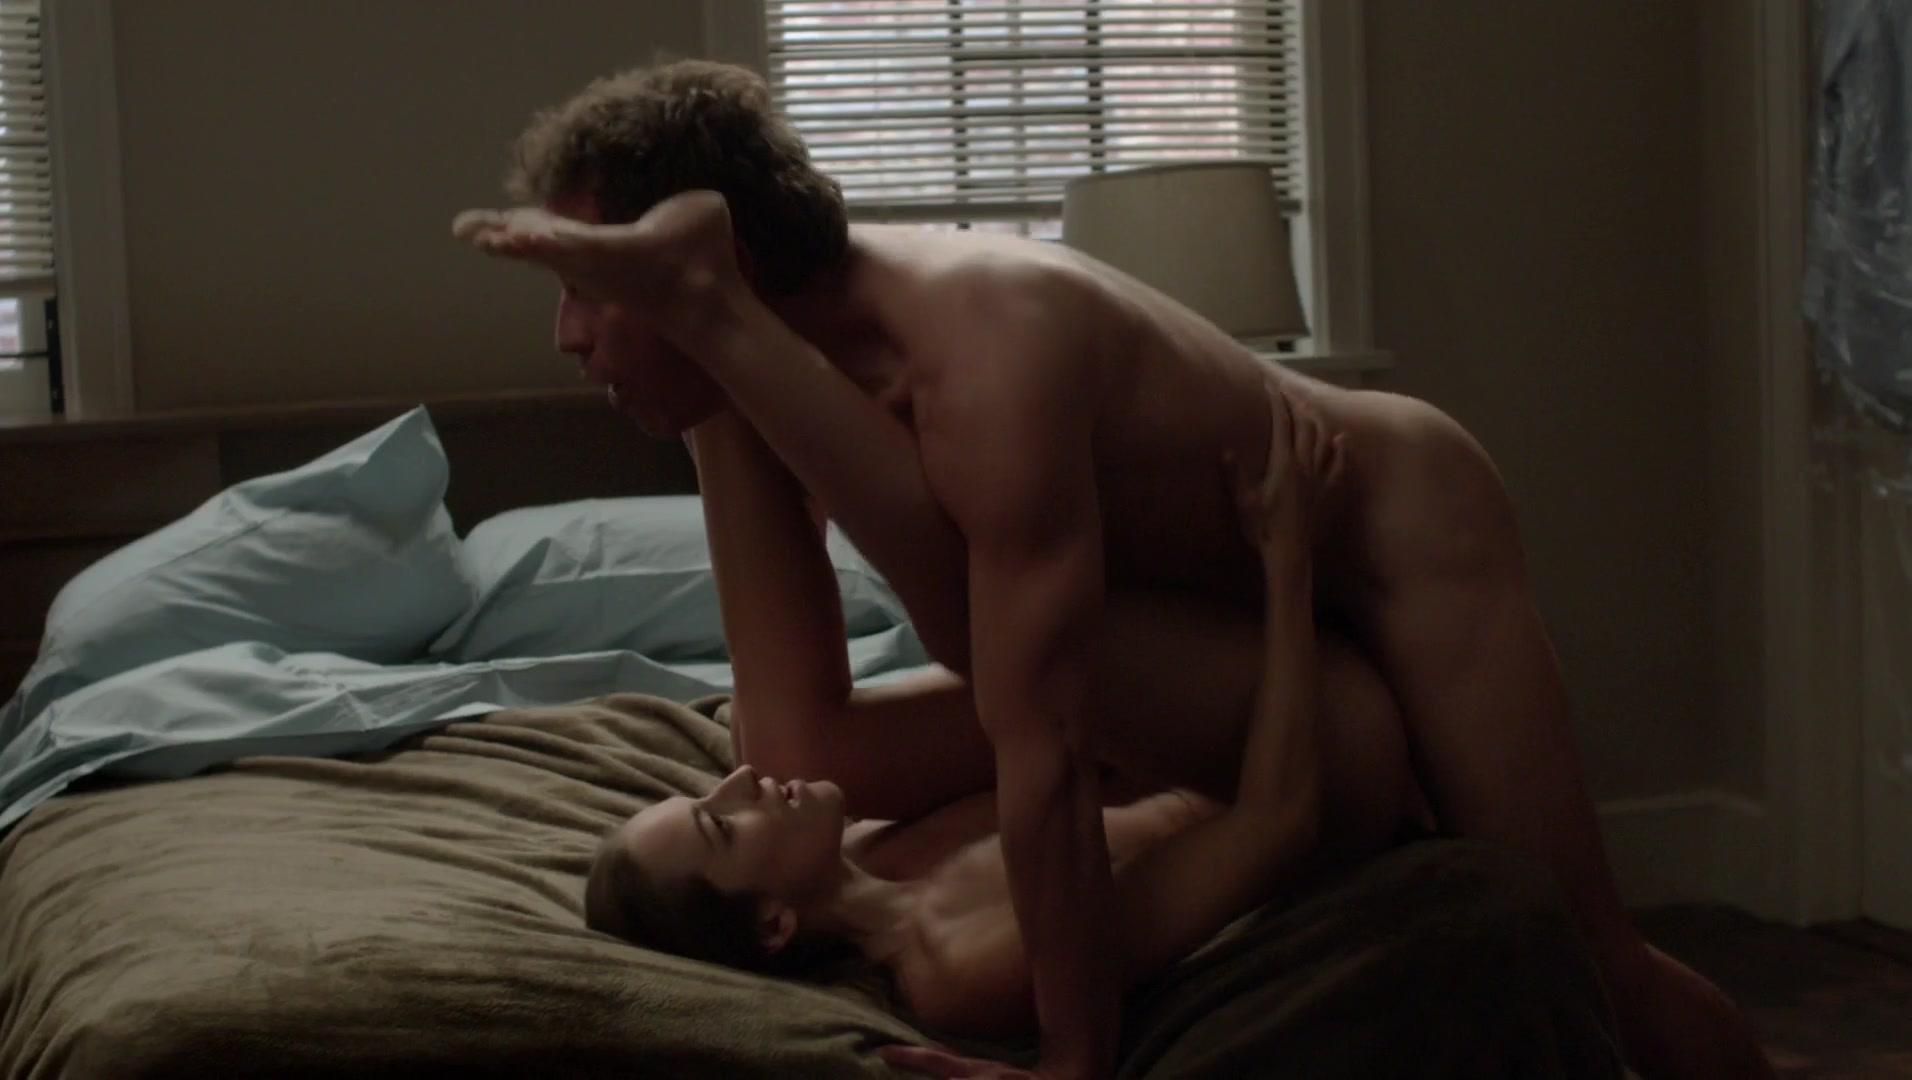 Lesbians kissing making sex